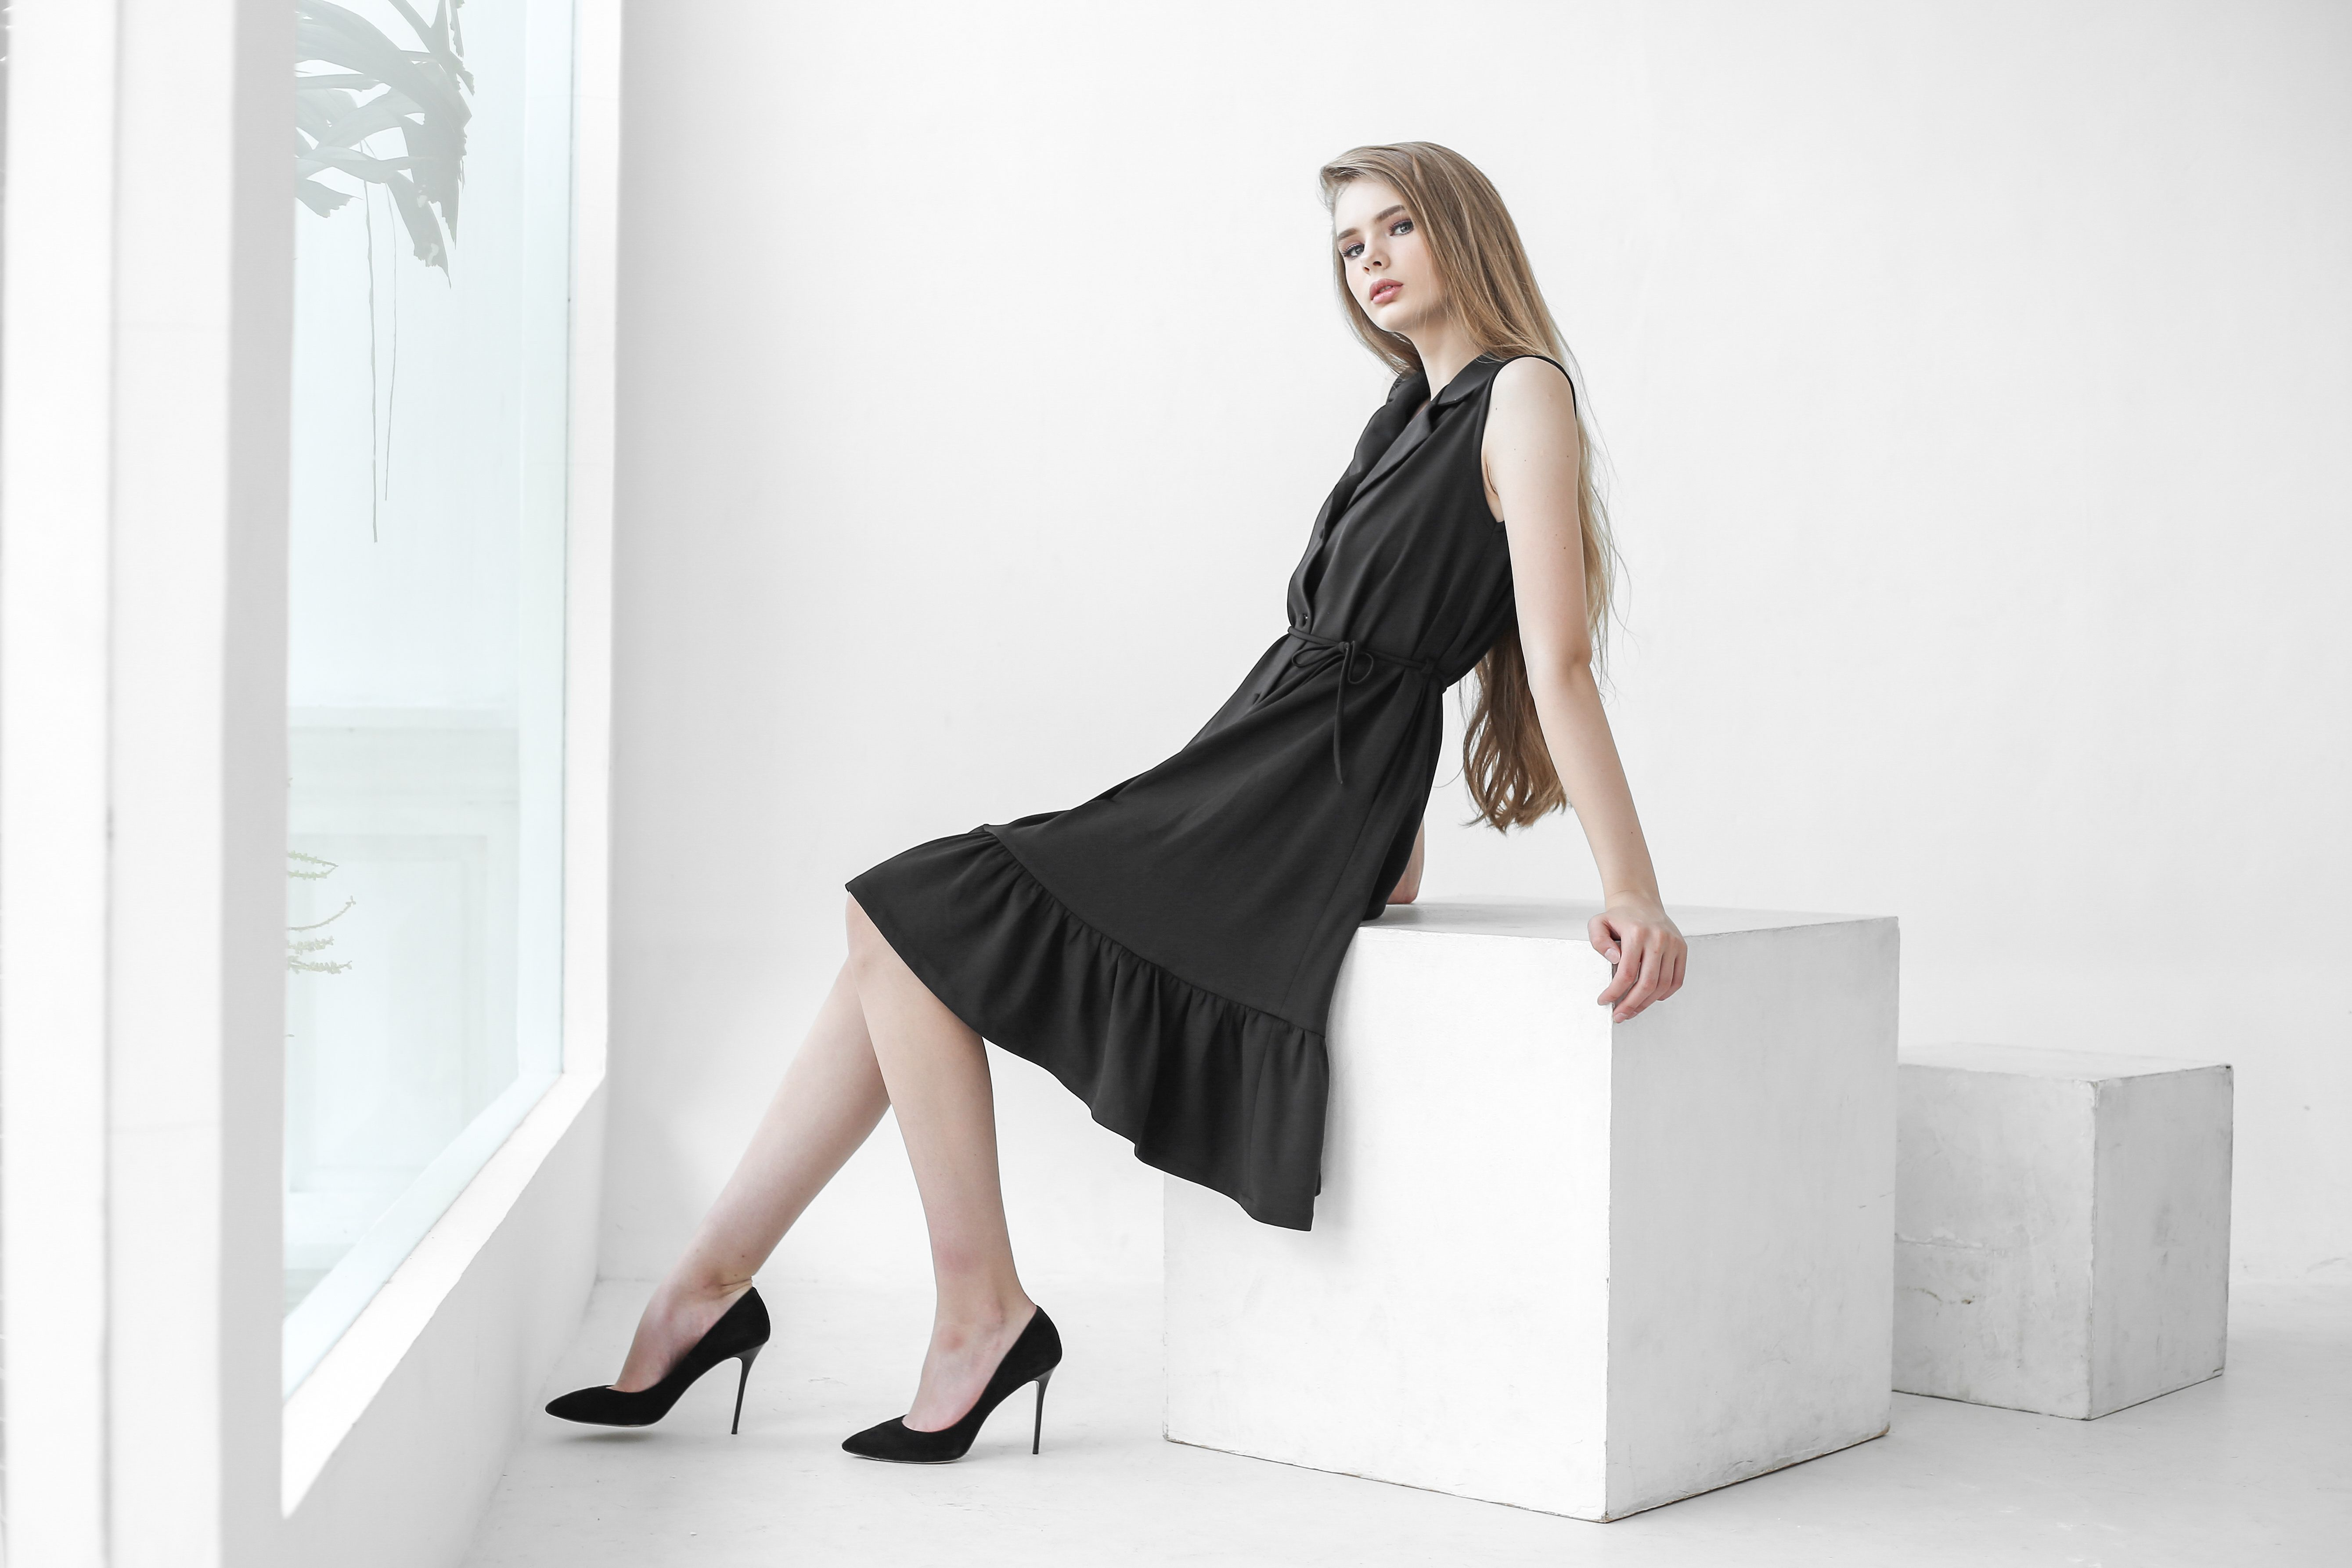 Relo Dress An Ultimate Sleeveless Sleek Black Dress Choice For Modern Urban Lady With Ruffle Botto Jolie Clothing Black Dress Dresses [ 3571 x 5357 Pixel ]